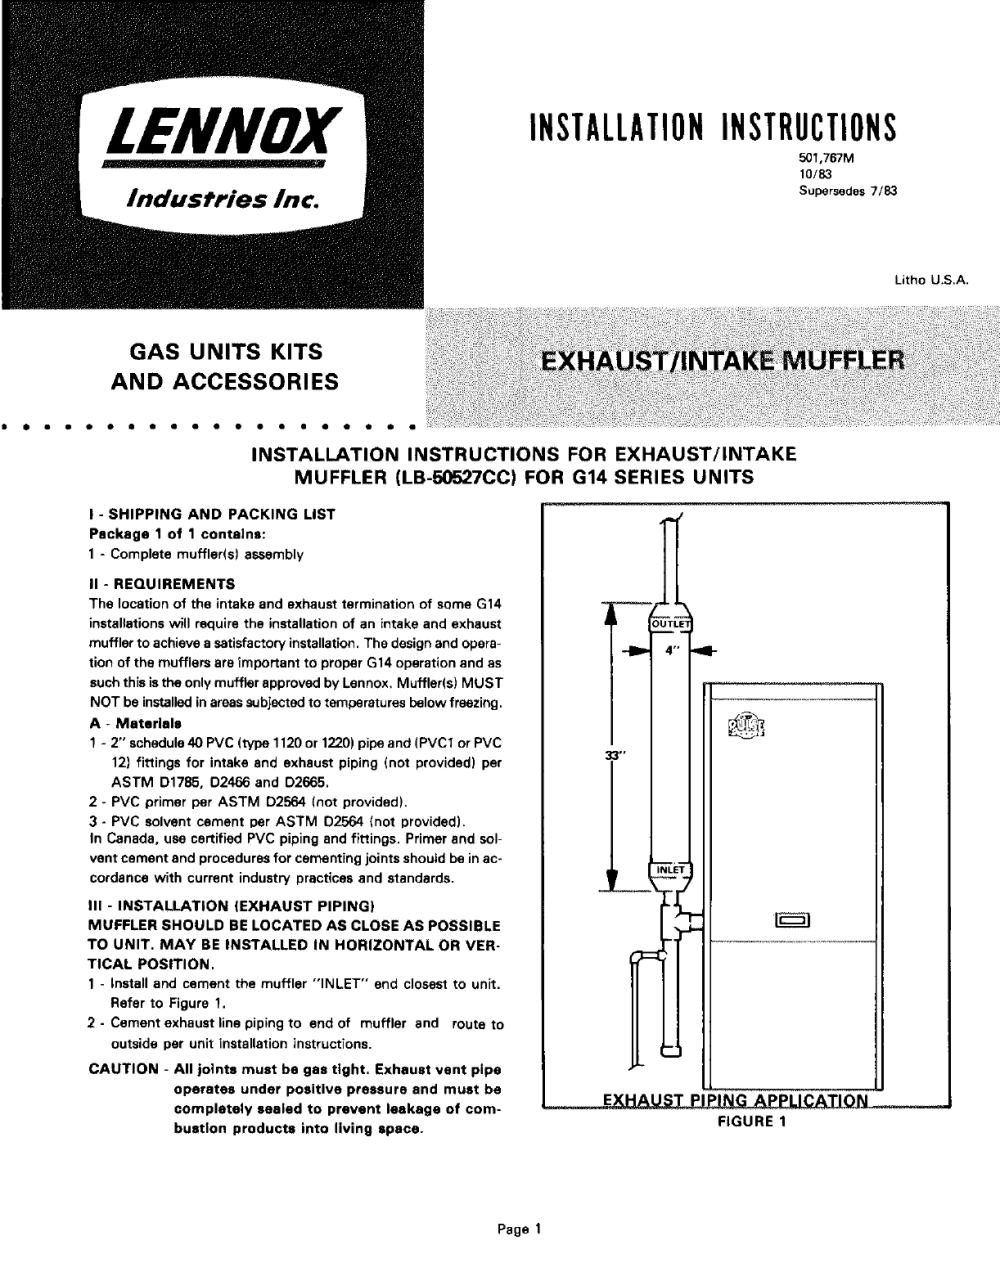 medium resolution of lennox g14 furnace wiring diagram